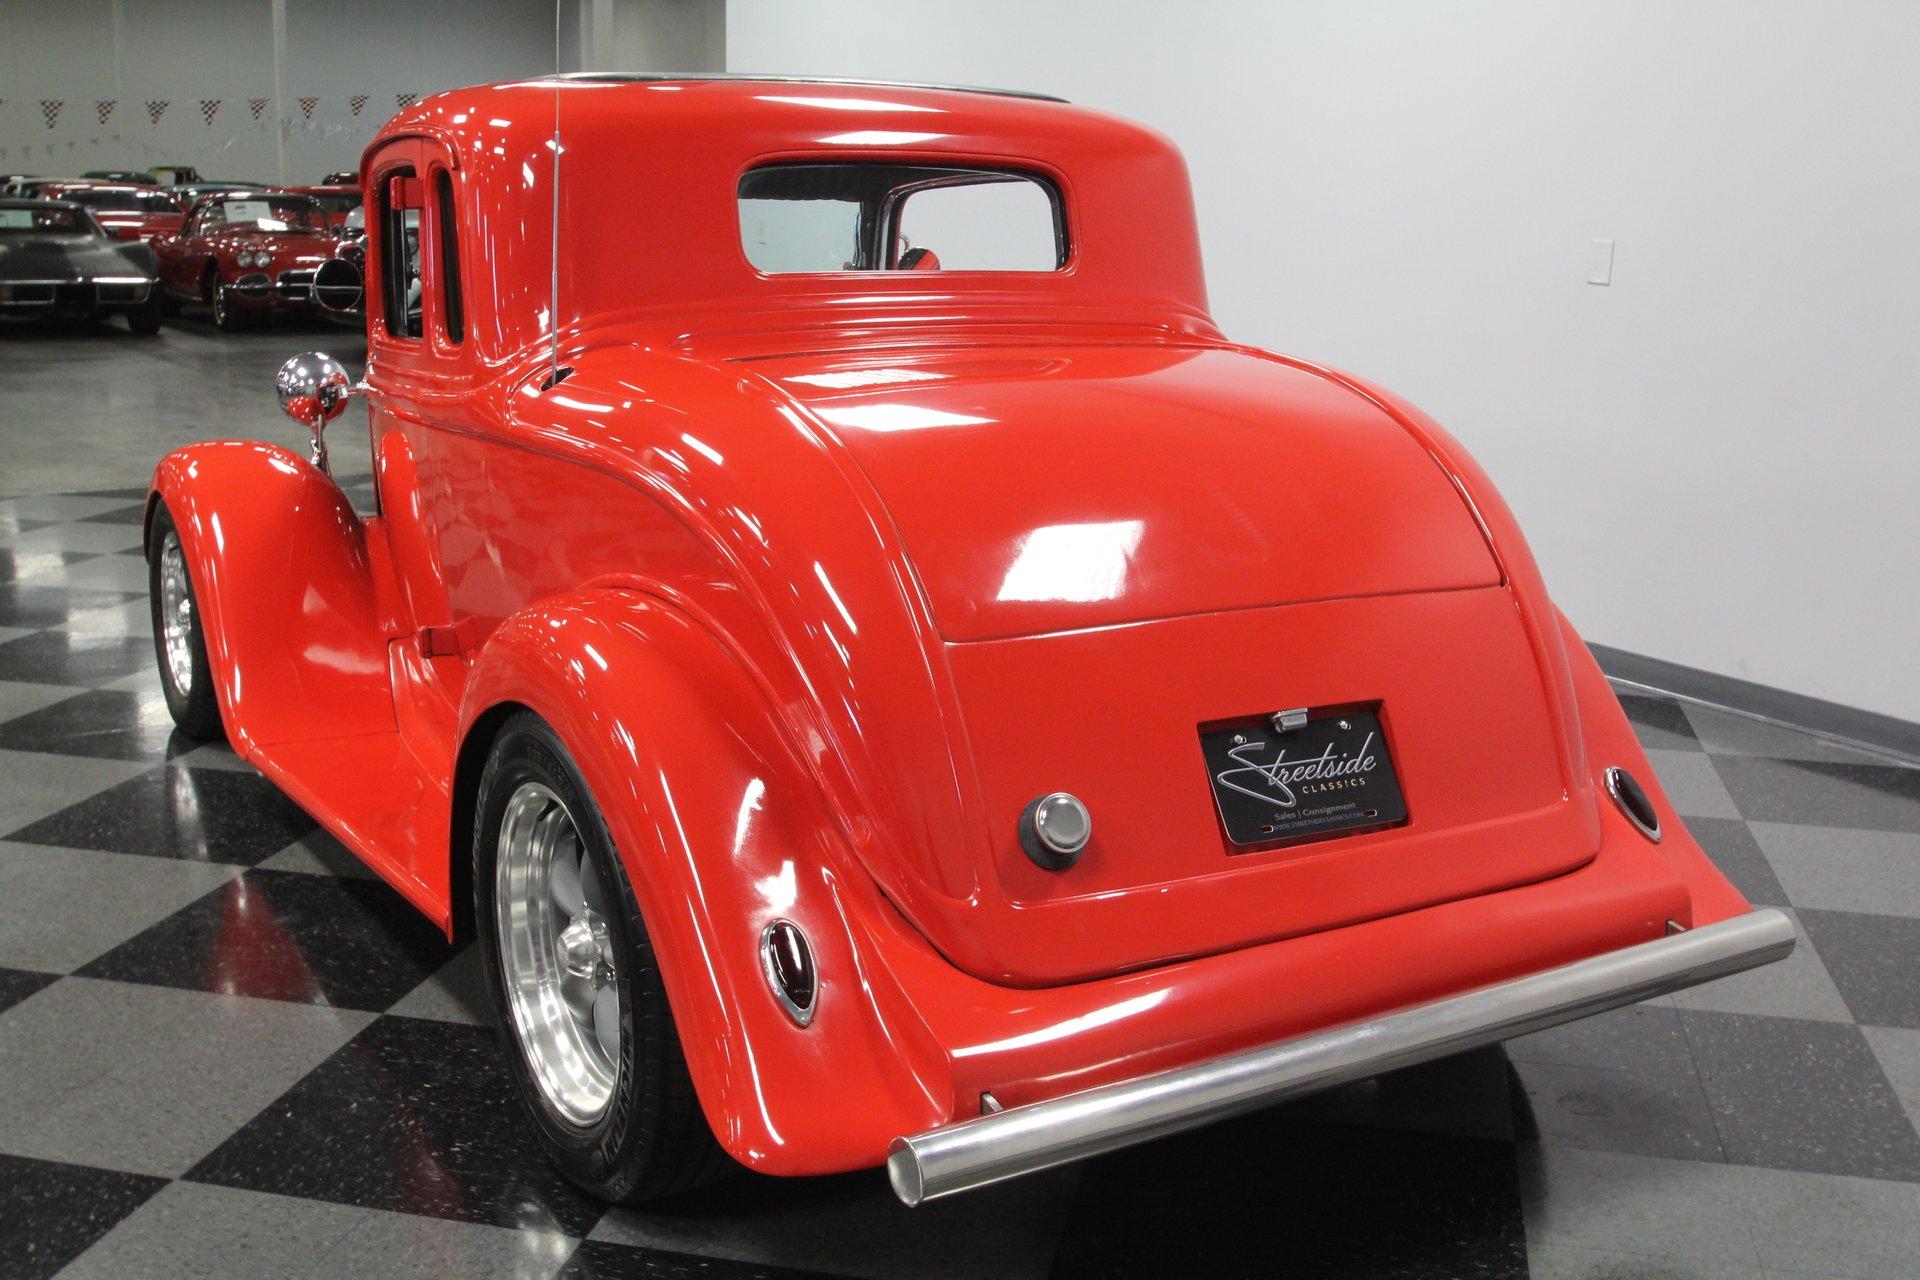 Phenomenal 1933 Plymouth 5 Window Coupe For Sale 103992 Mcg Spiritservingveterans Wood Chair Design Ideas Spiritservingveteransorg